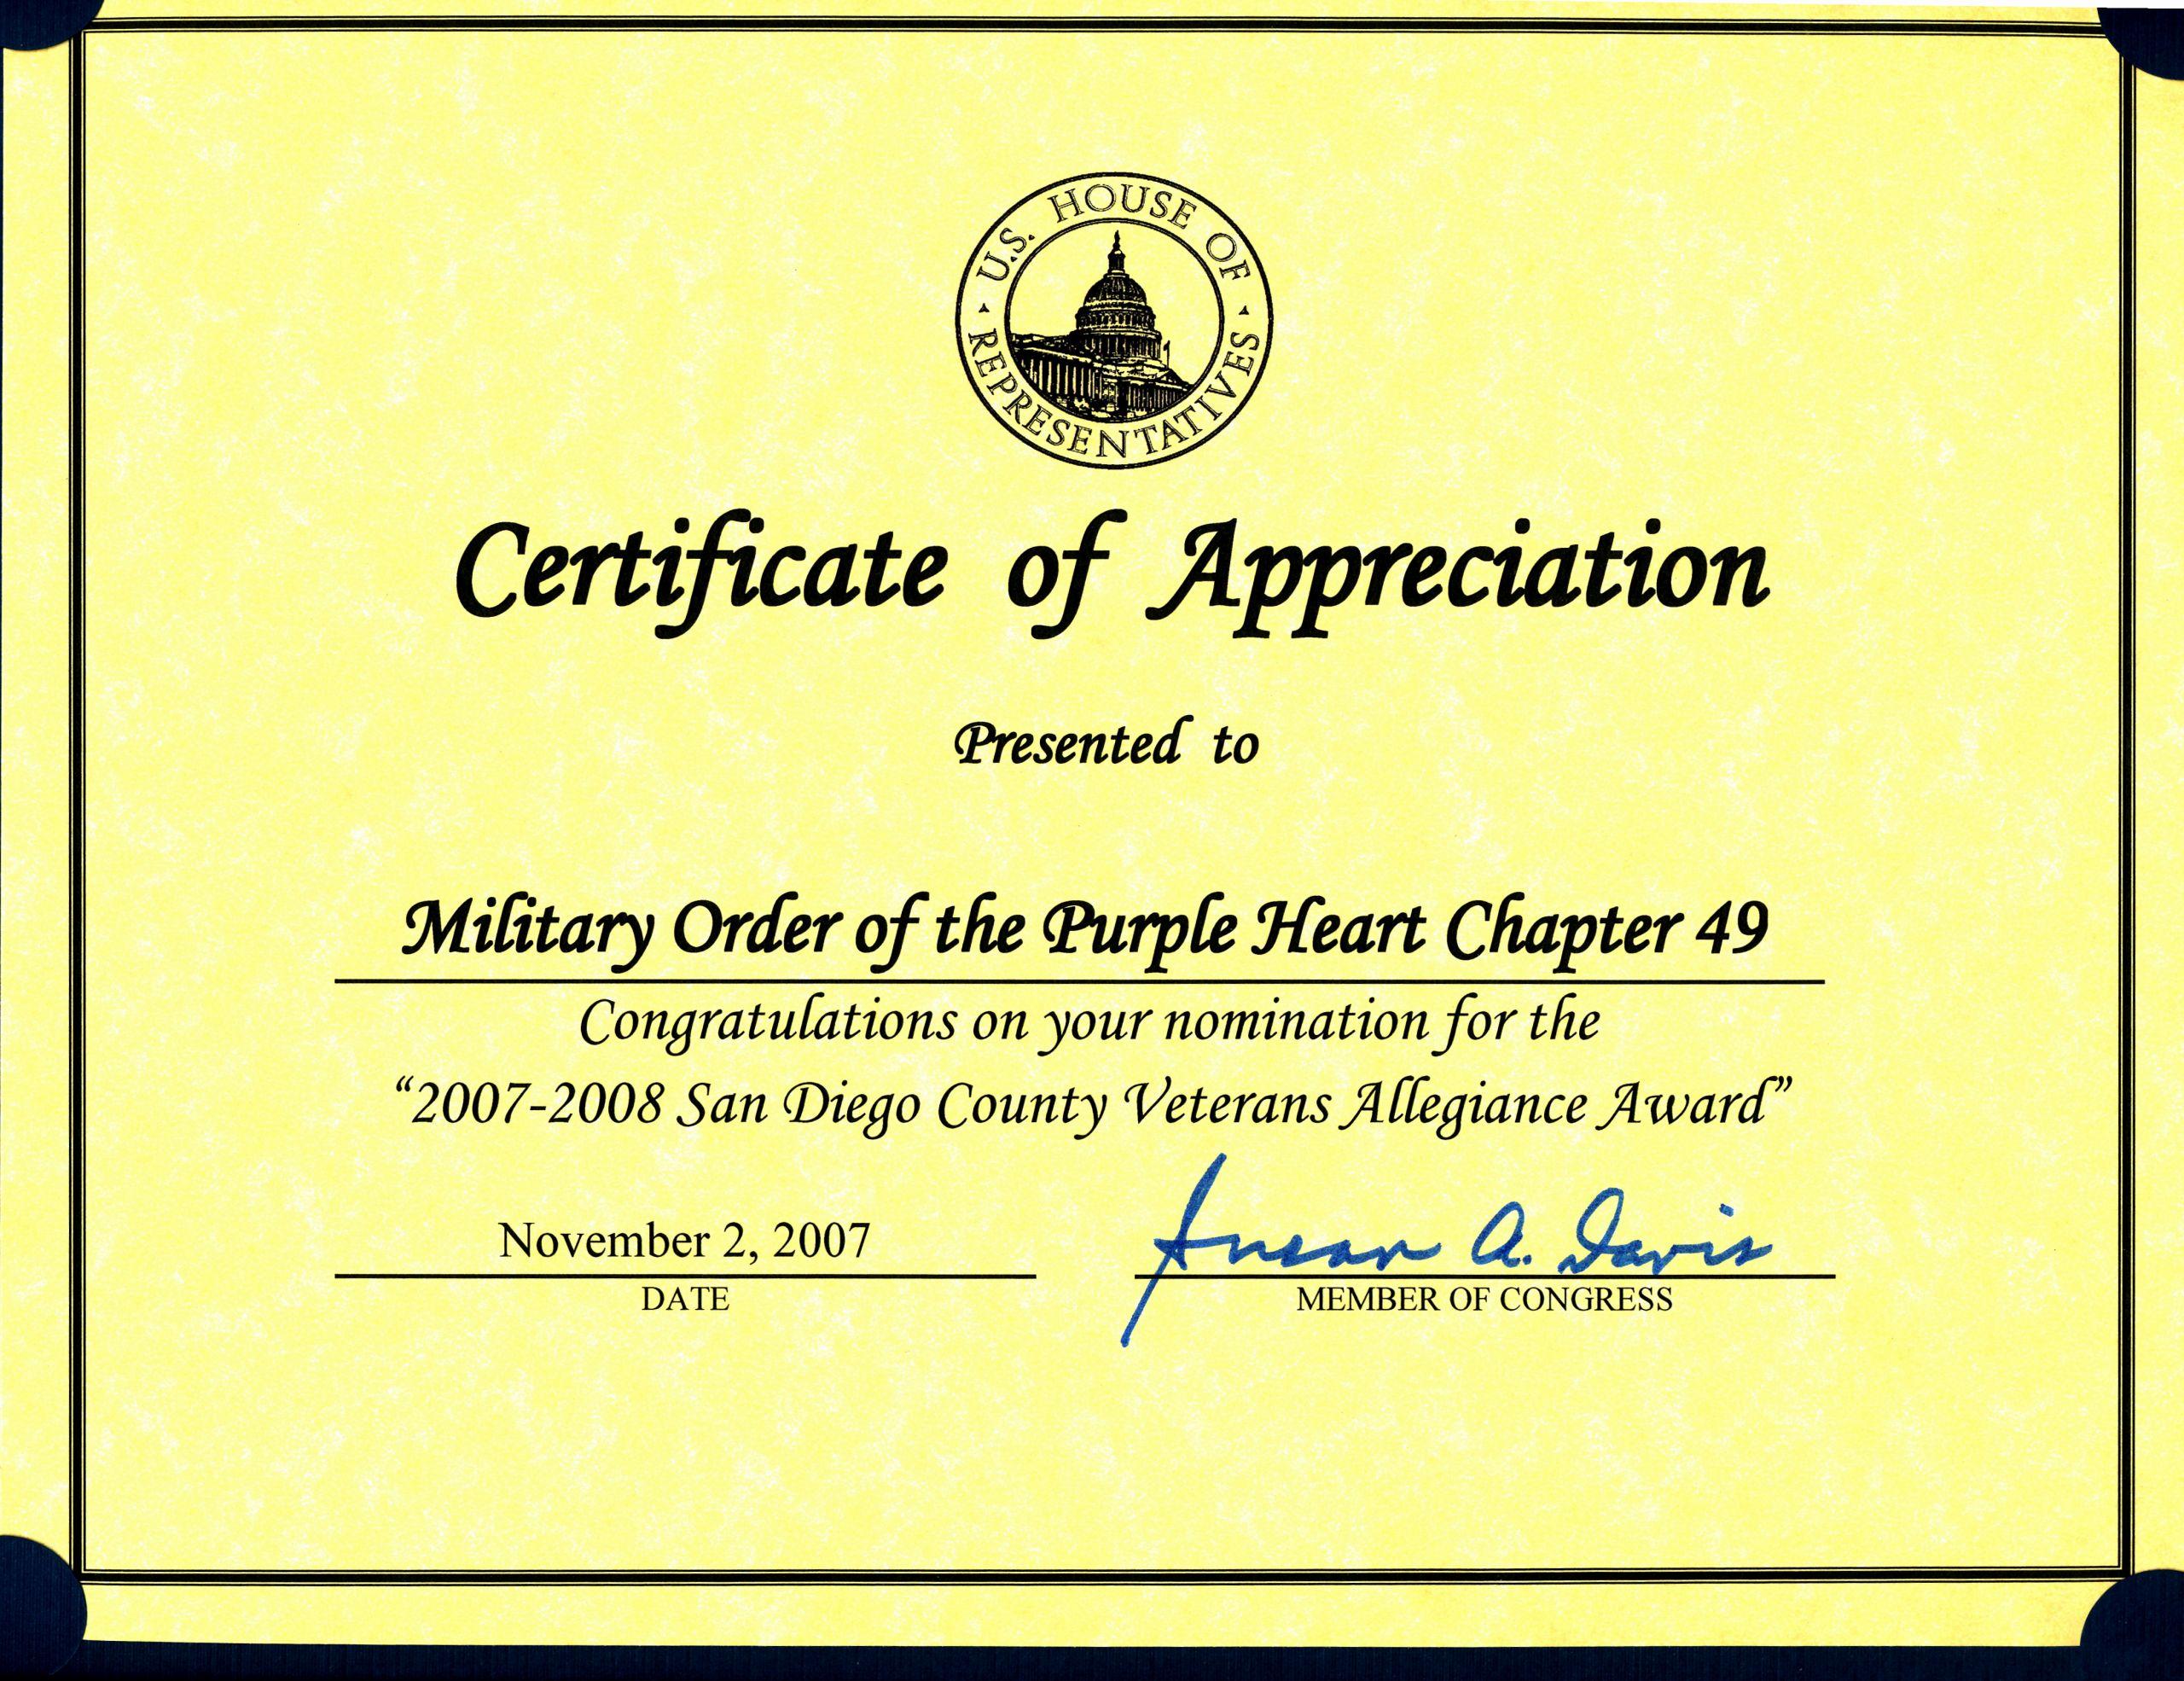 Veteran Appreciation Certificate Template Fresh Military order Of the Purple Heart Sunny Jones Chapter 49